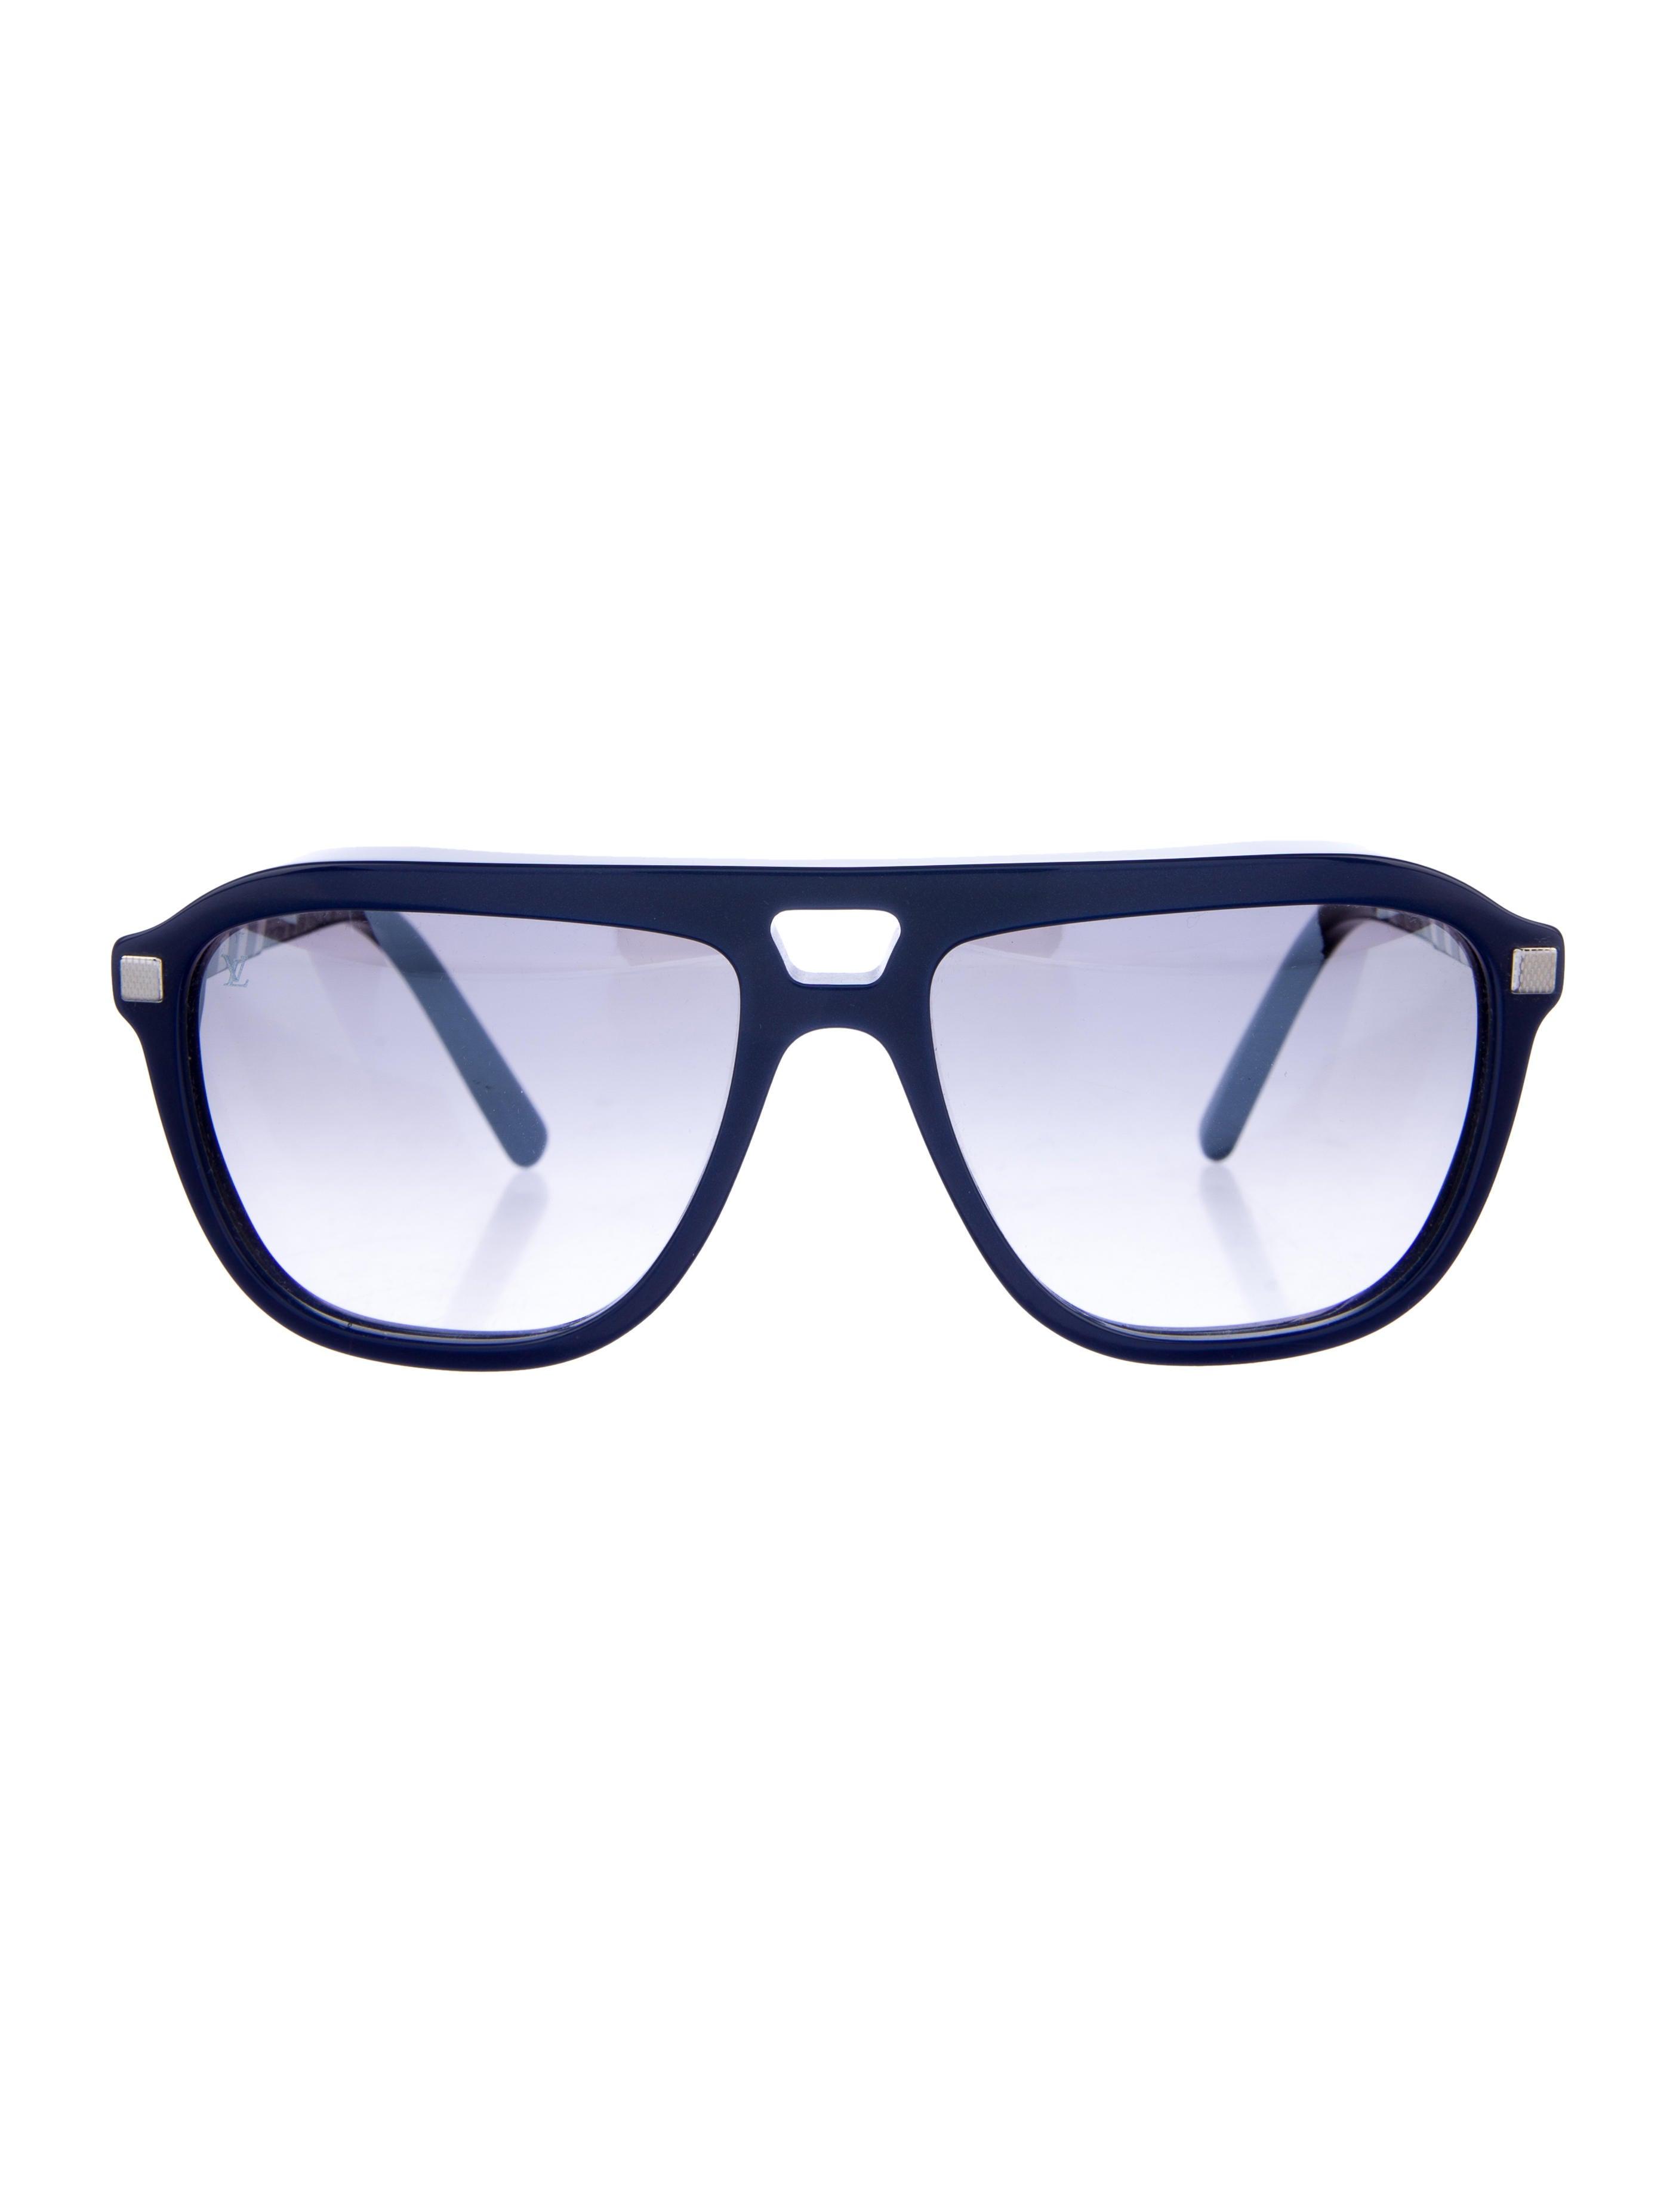 cb104bbaebeee Louis Vuitton Conviction Pilot Sunglasses - Accessories - LOU106709 ...